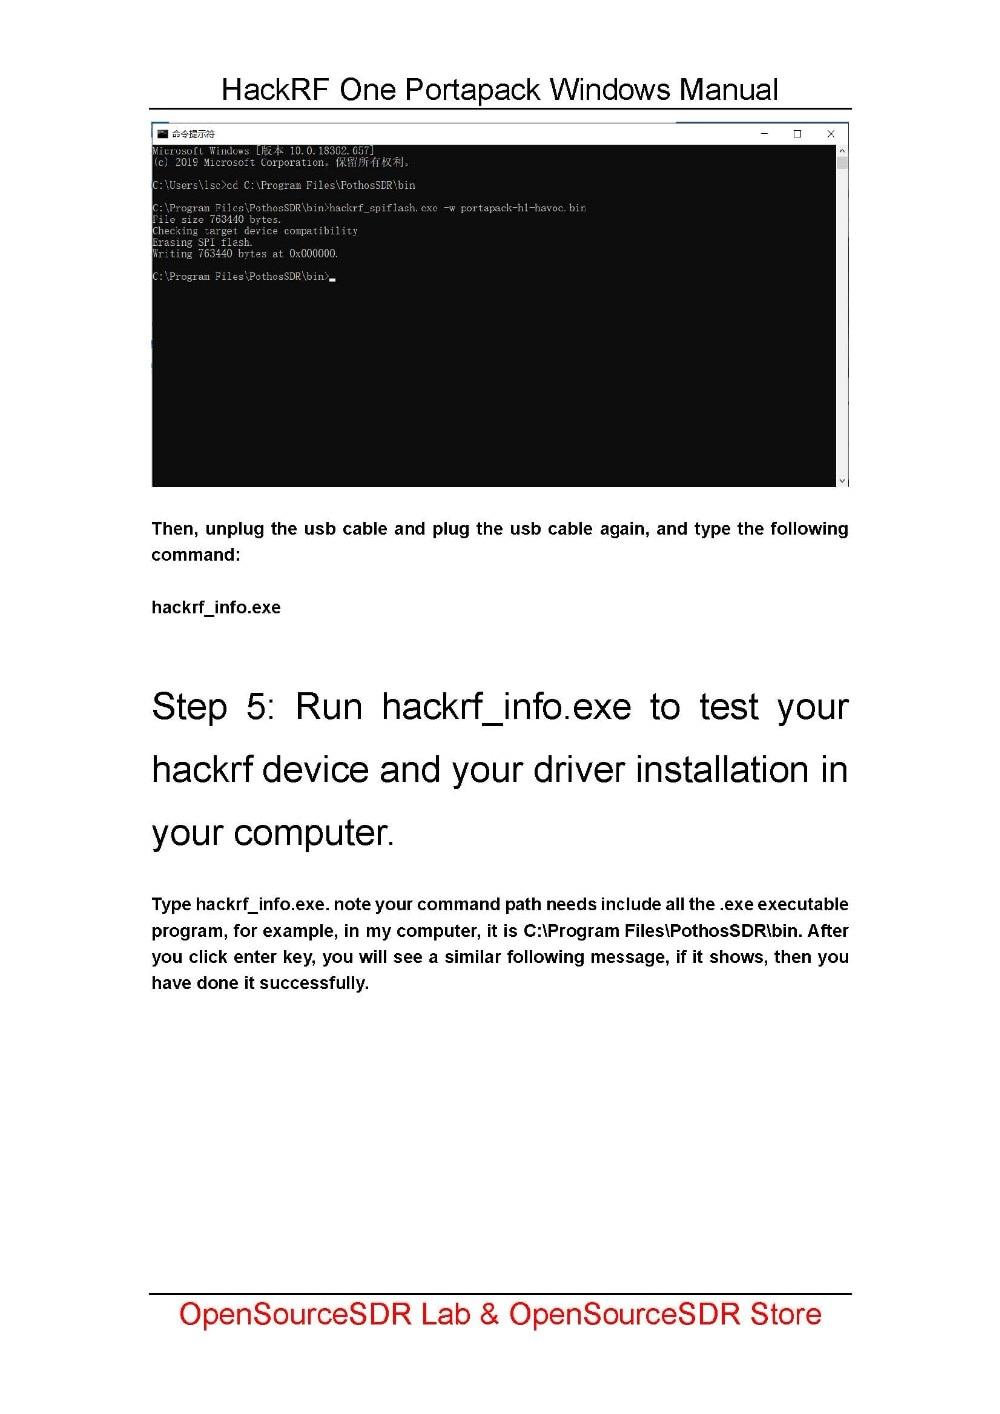 HackRF portapack windows_页面_13